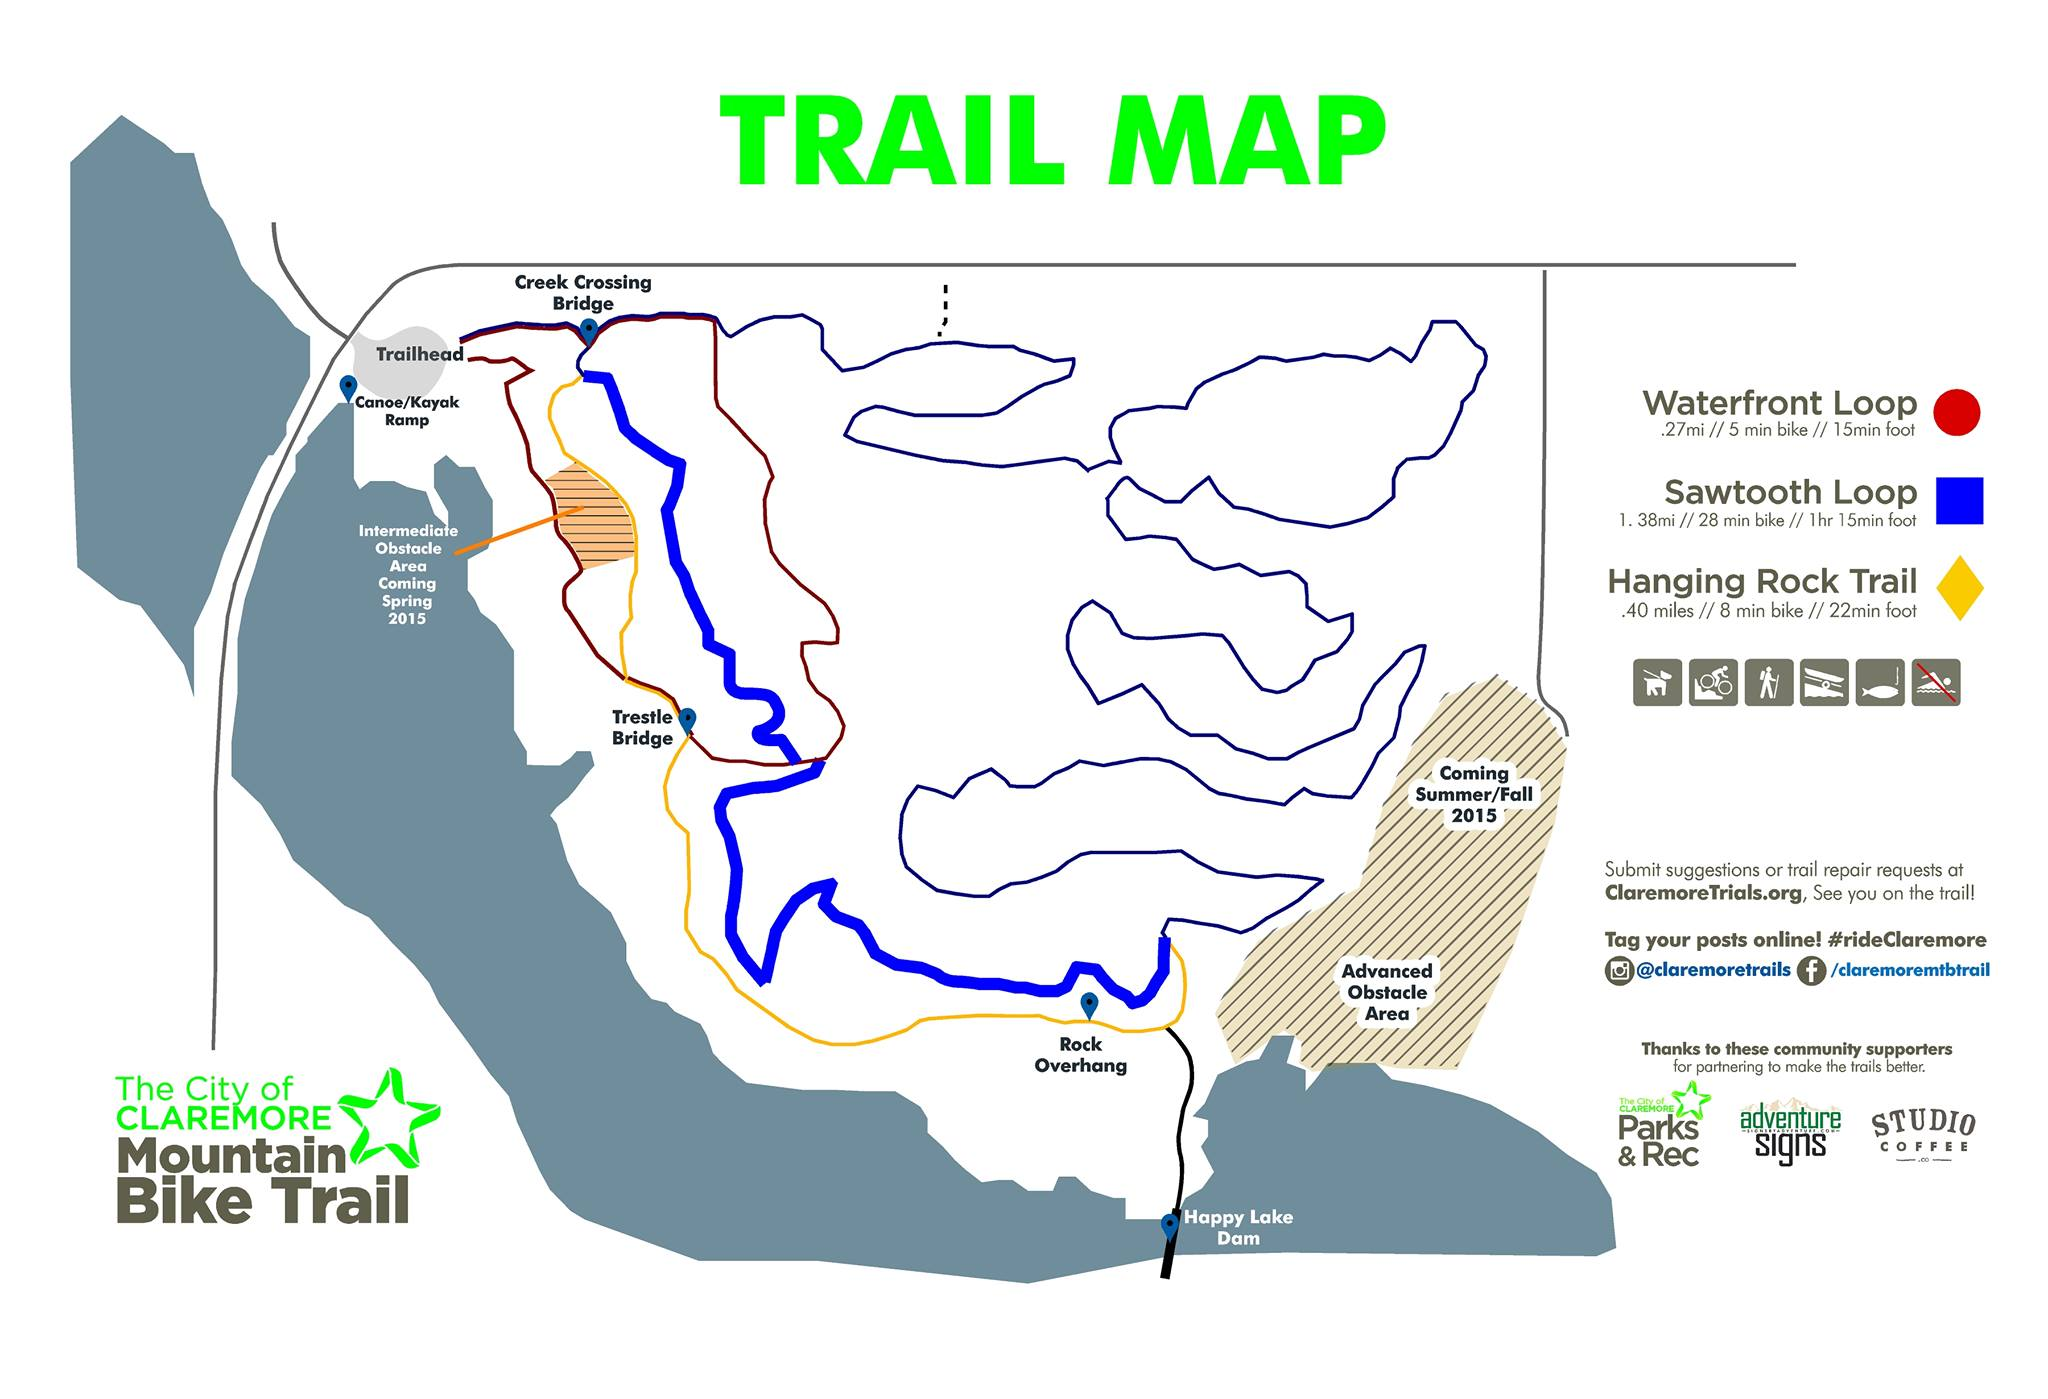 Mountain Bike Trail (Map)